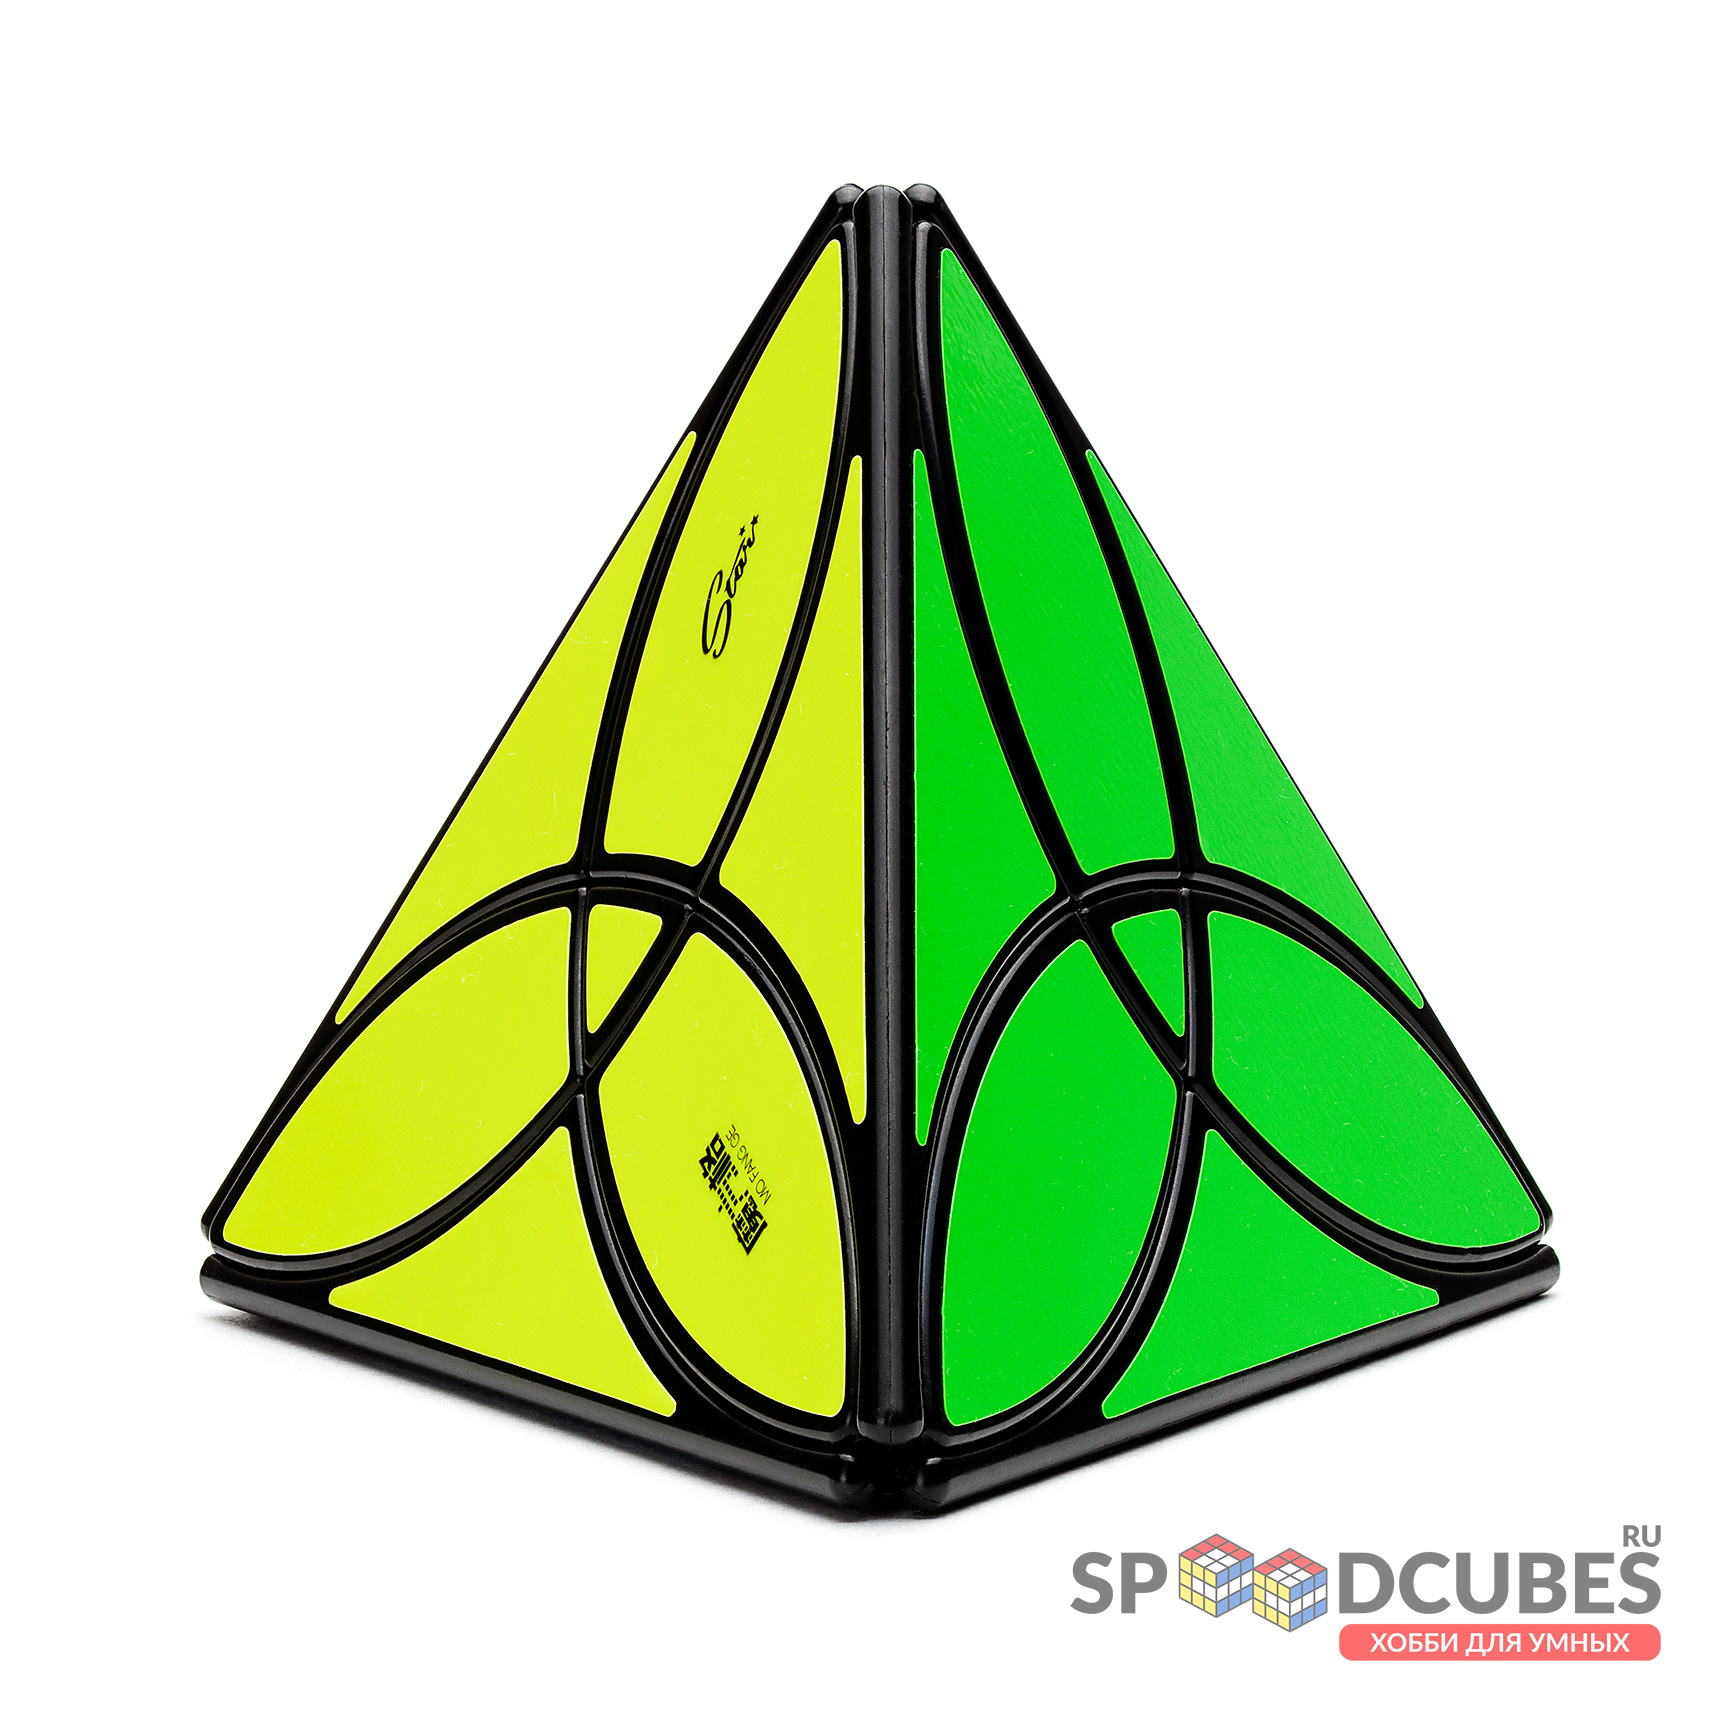 QiYi (MoFangGe) Clover Pyraminx